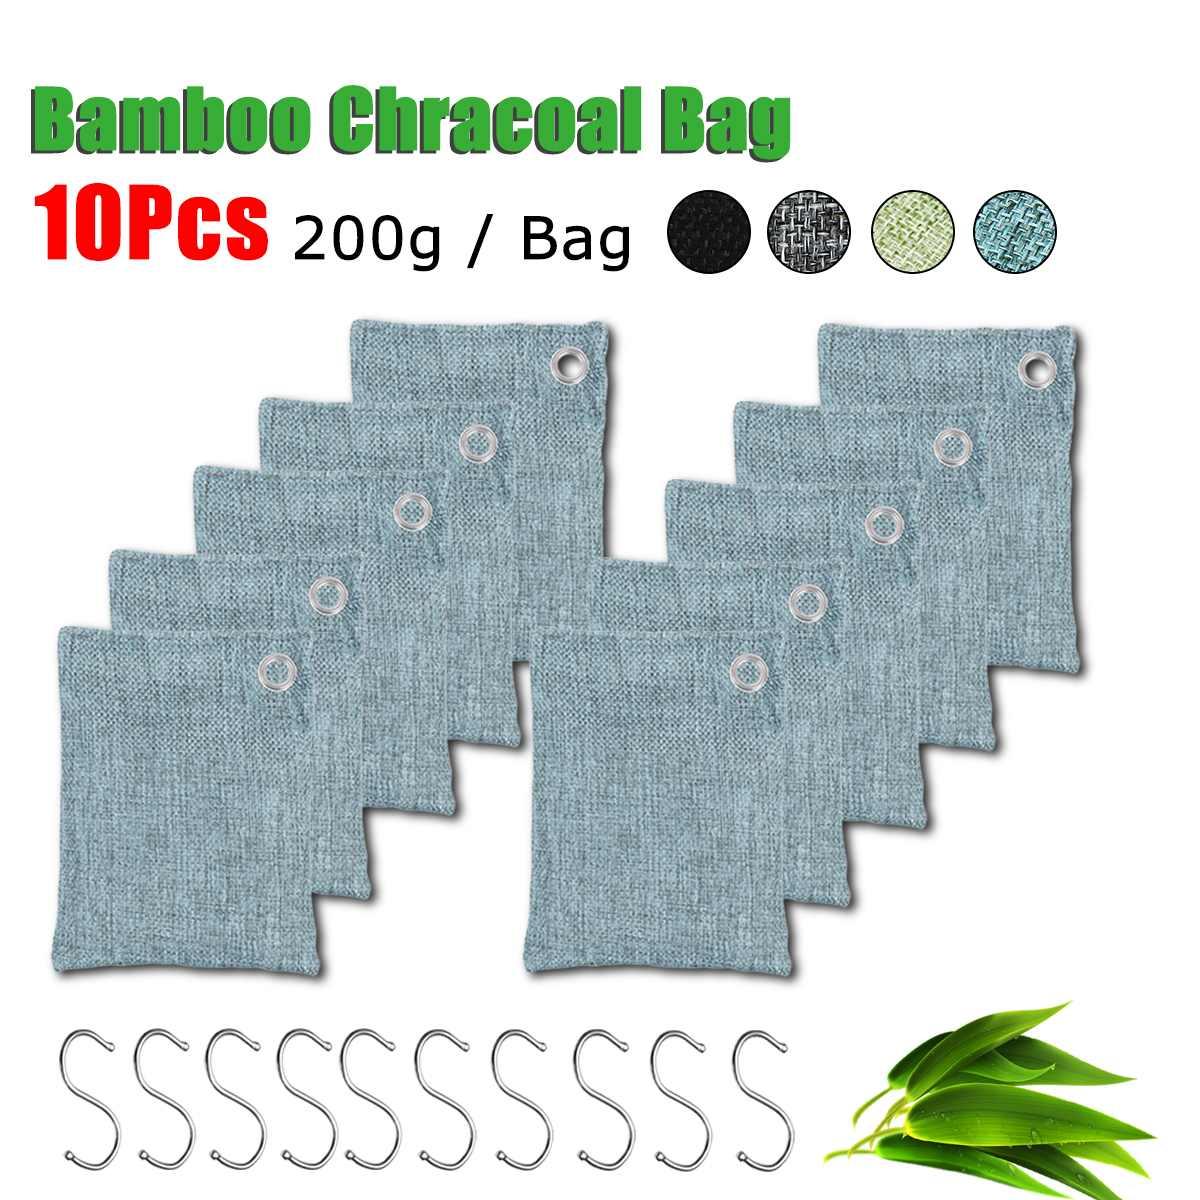 2/6/8/10/Bags Air Purifier Bag Car Home Shoes Bamboo Charcoal Dehumidifier Odor Remover Air Purifying Bag Natural Air Freshener